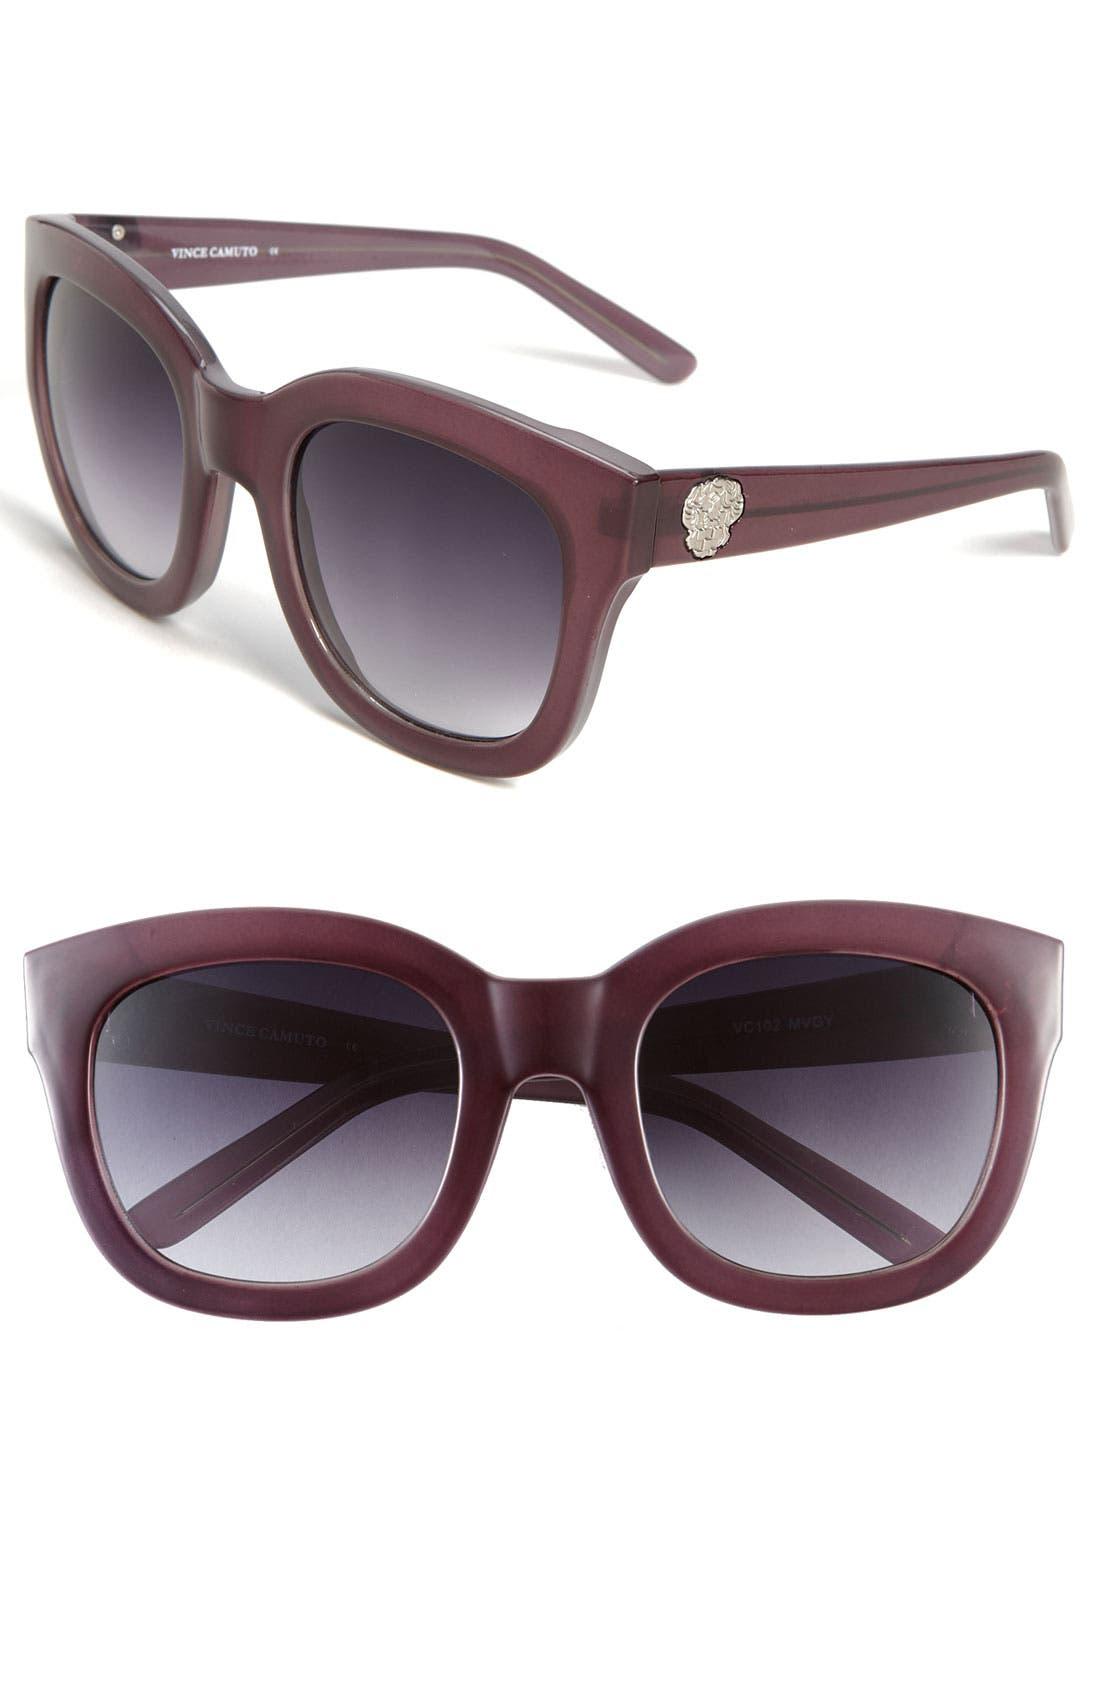 Main Image - Vince Camuto 54mm Oversized Cat Eye Sunglasses